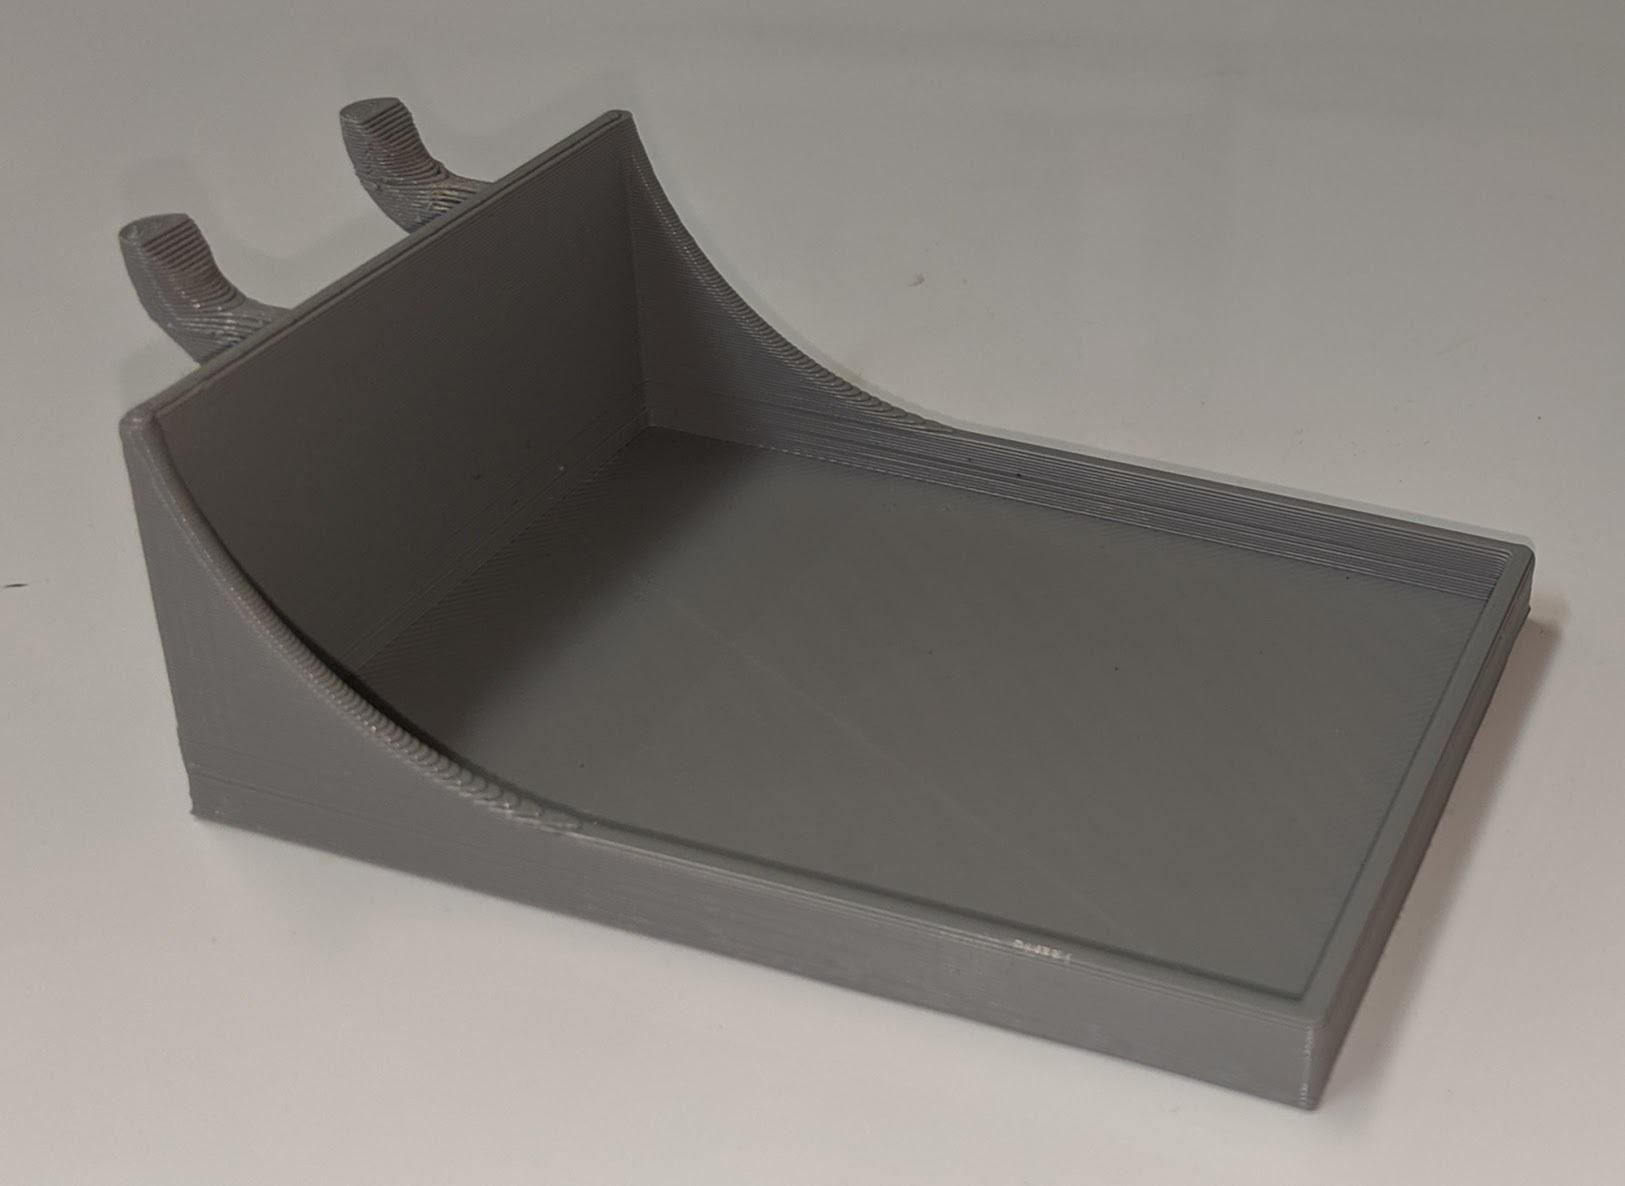 IMG_20190612_194820.jpg Download free STL file Pegboard Tray for hex bit holder • Design to 3D print, huberjer